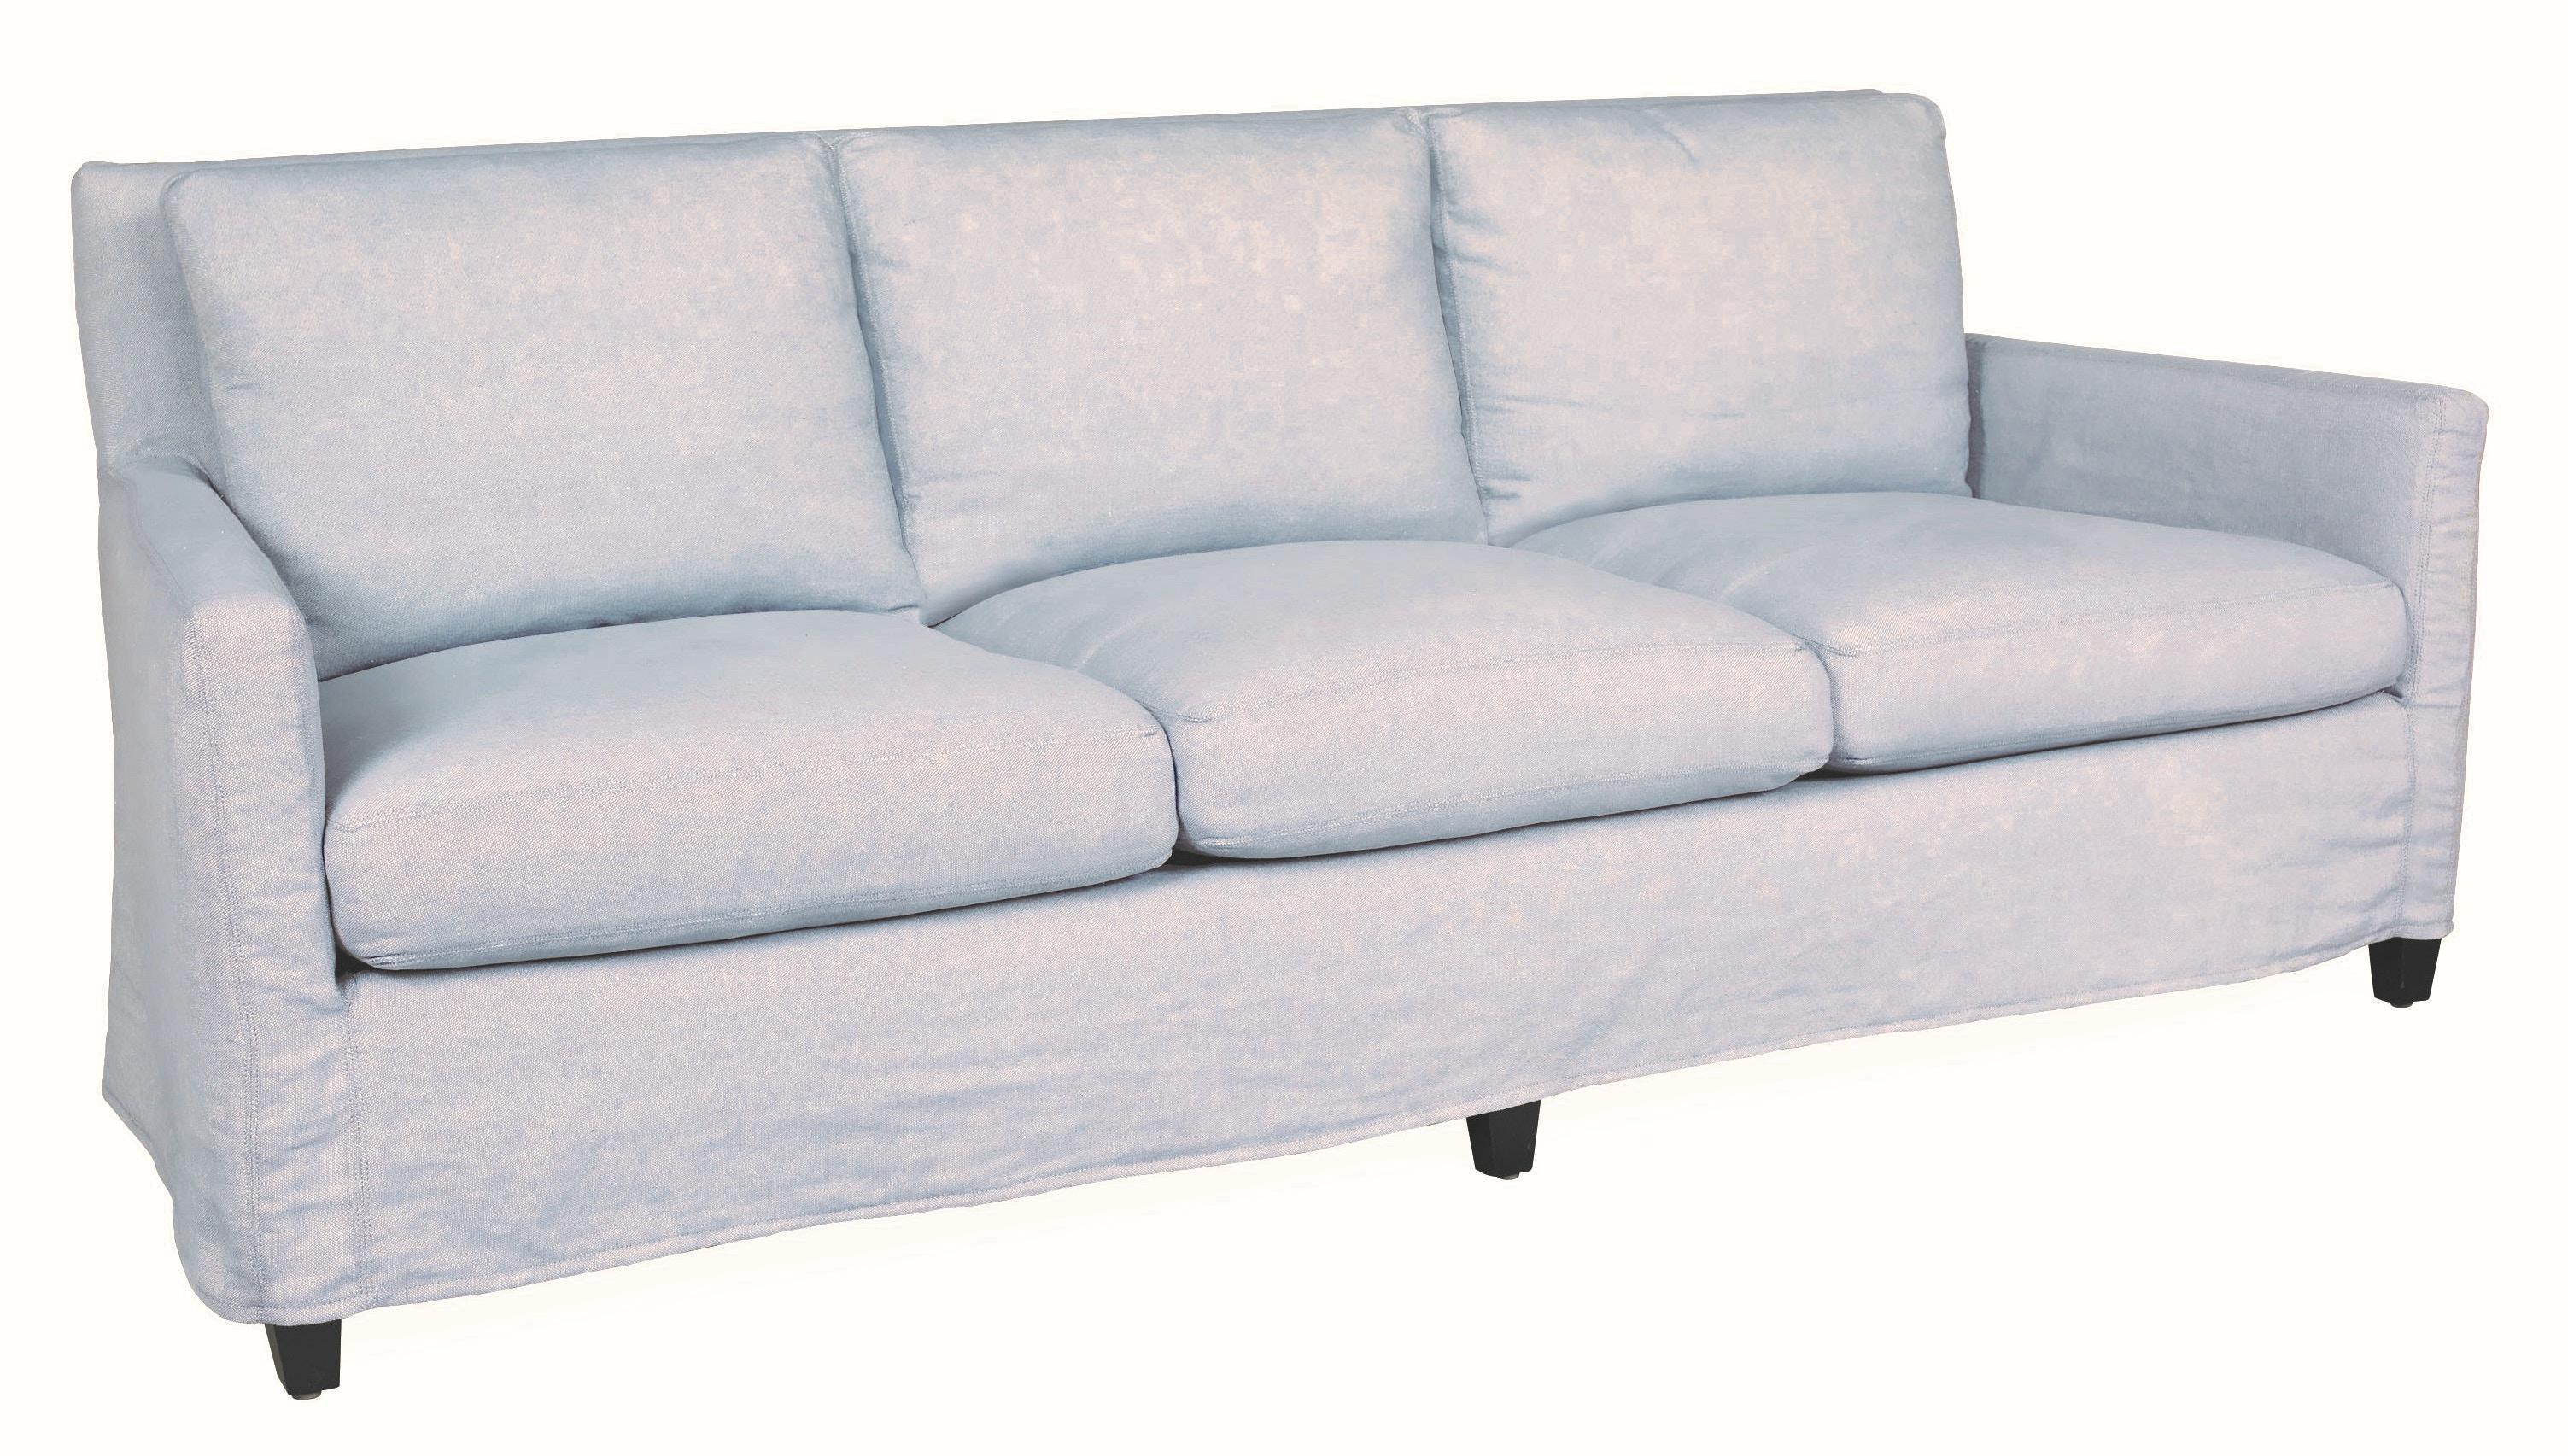 lee industries slipcovered sofa outdoor lee industries slipcovered sofa c129603 living room shofers